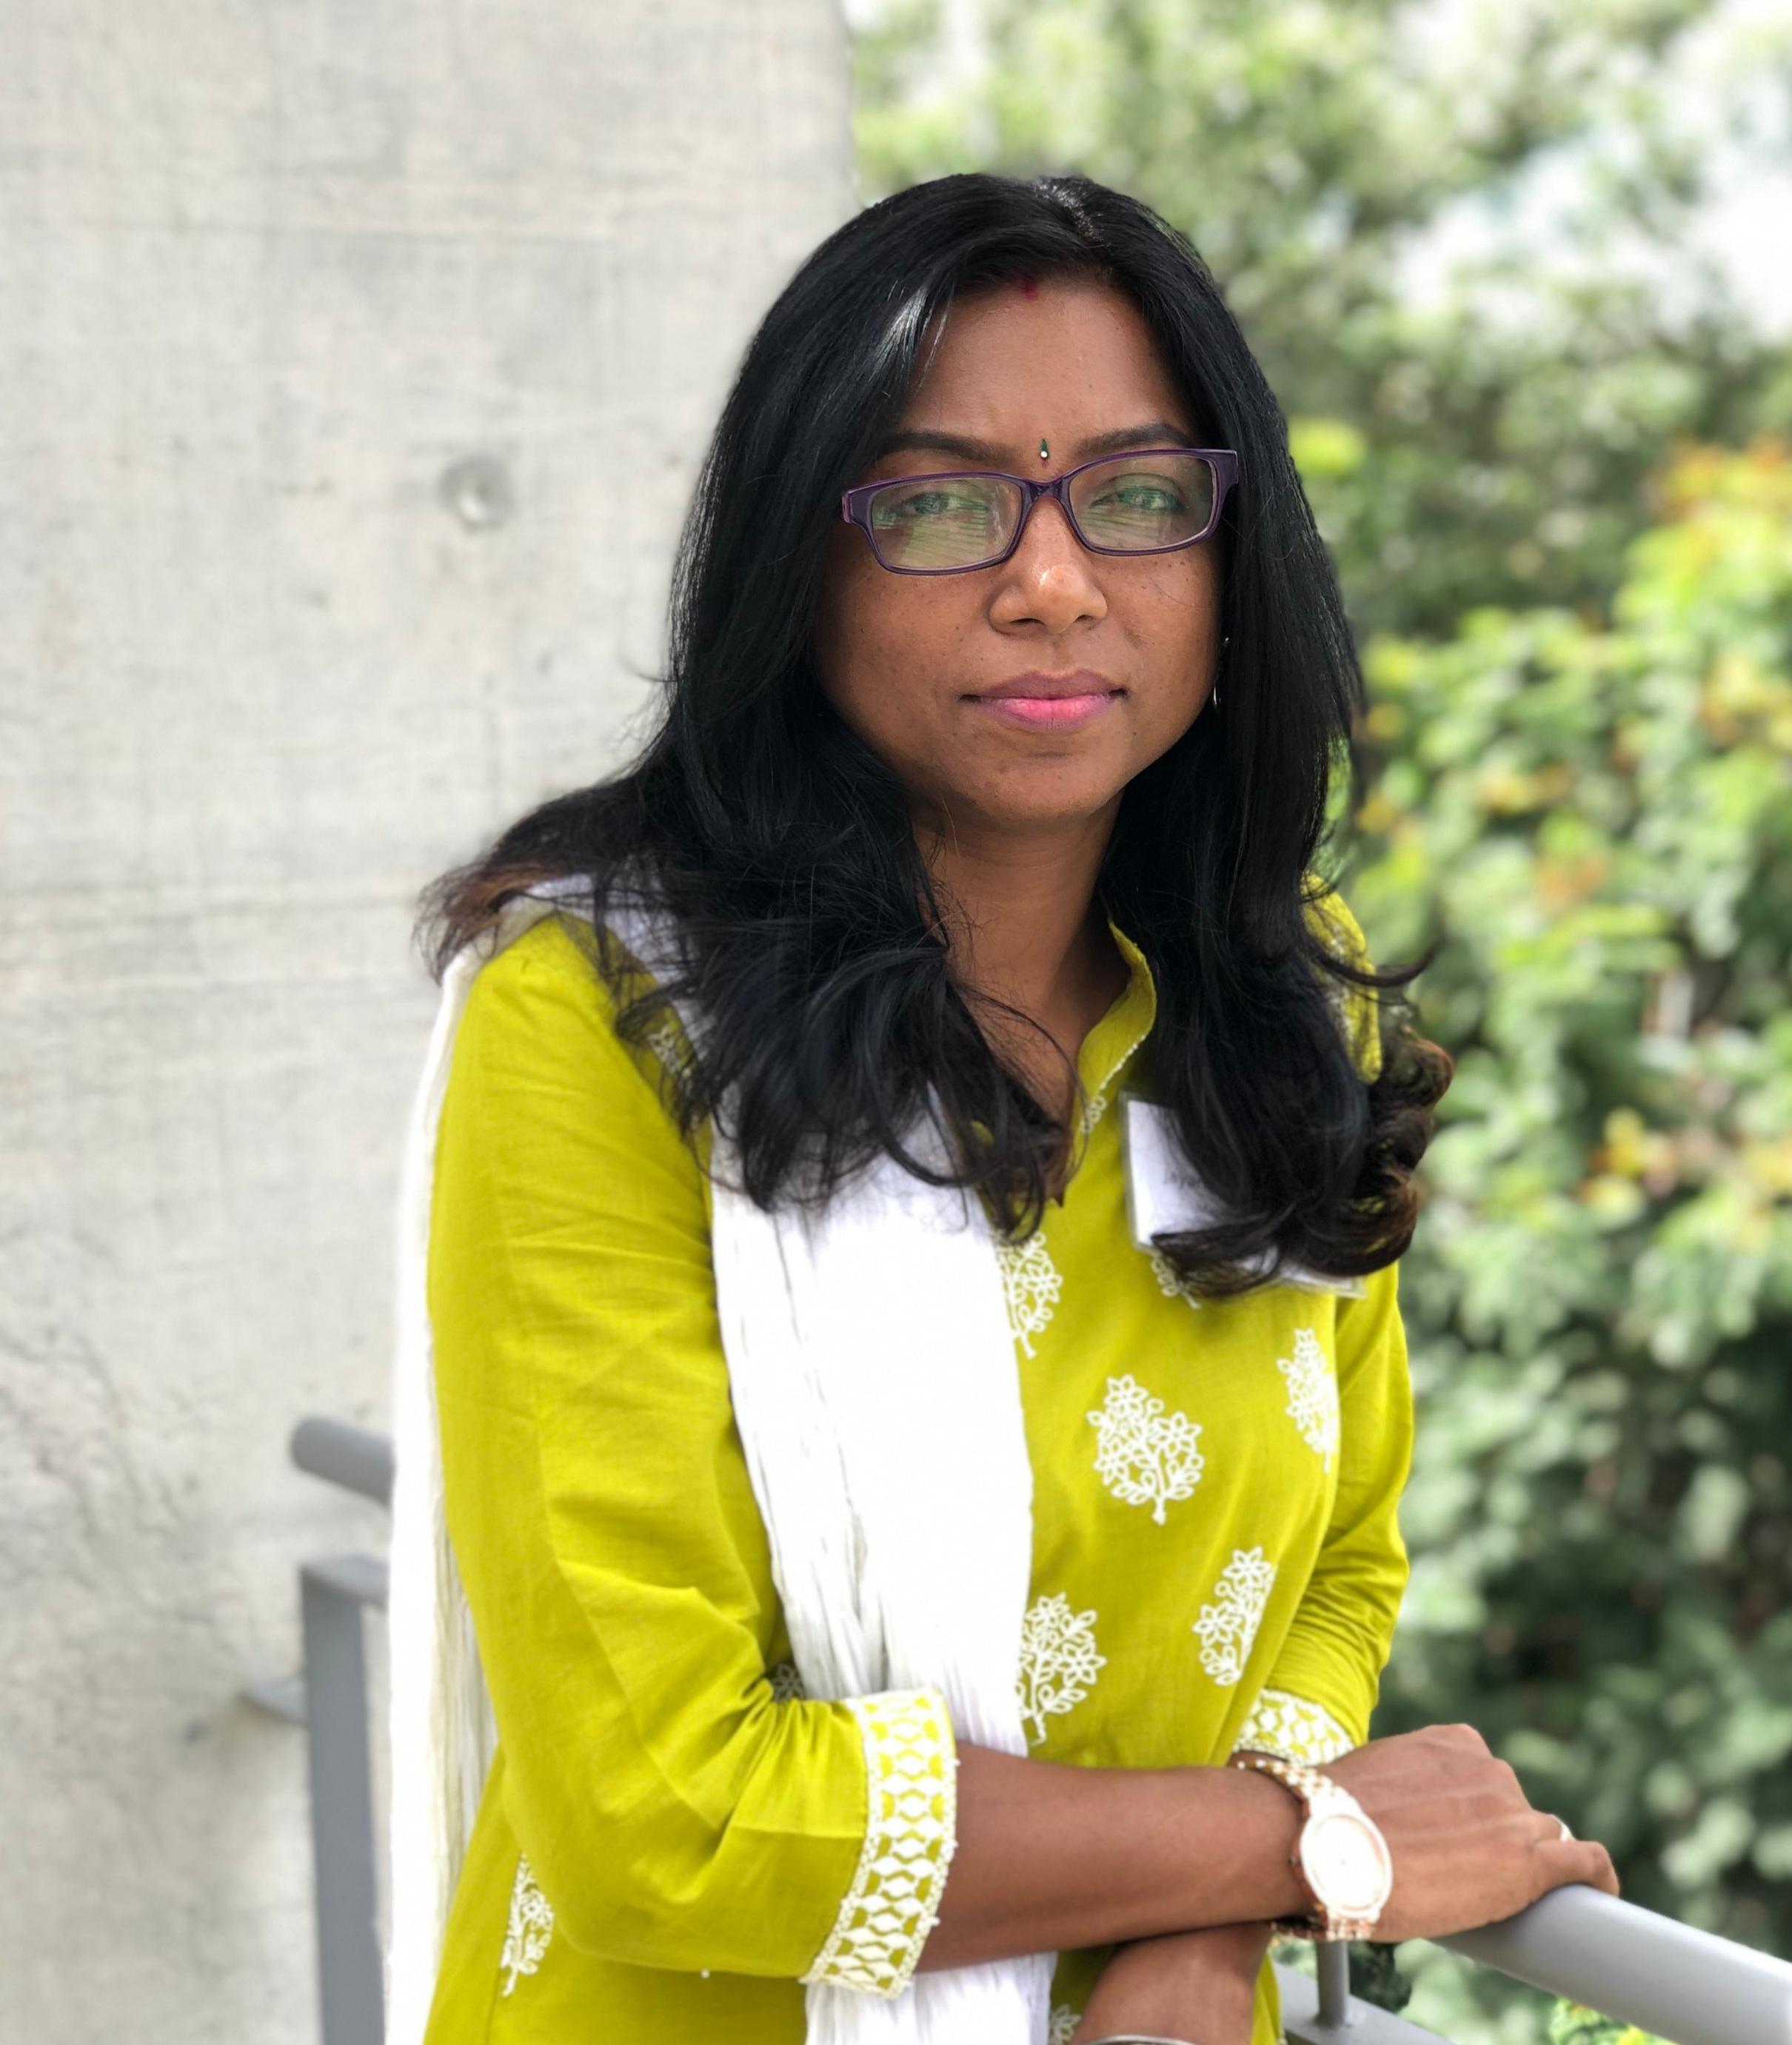 Jayanti Mahapatra, founder and CEO of Manikstu Agro